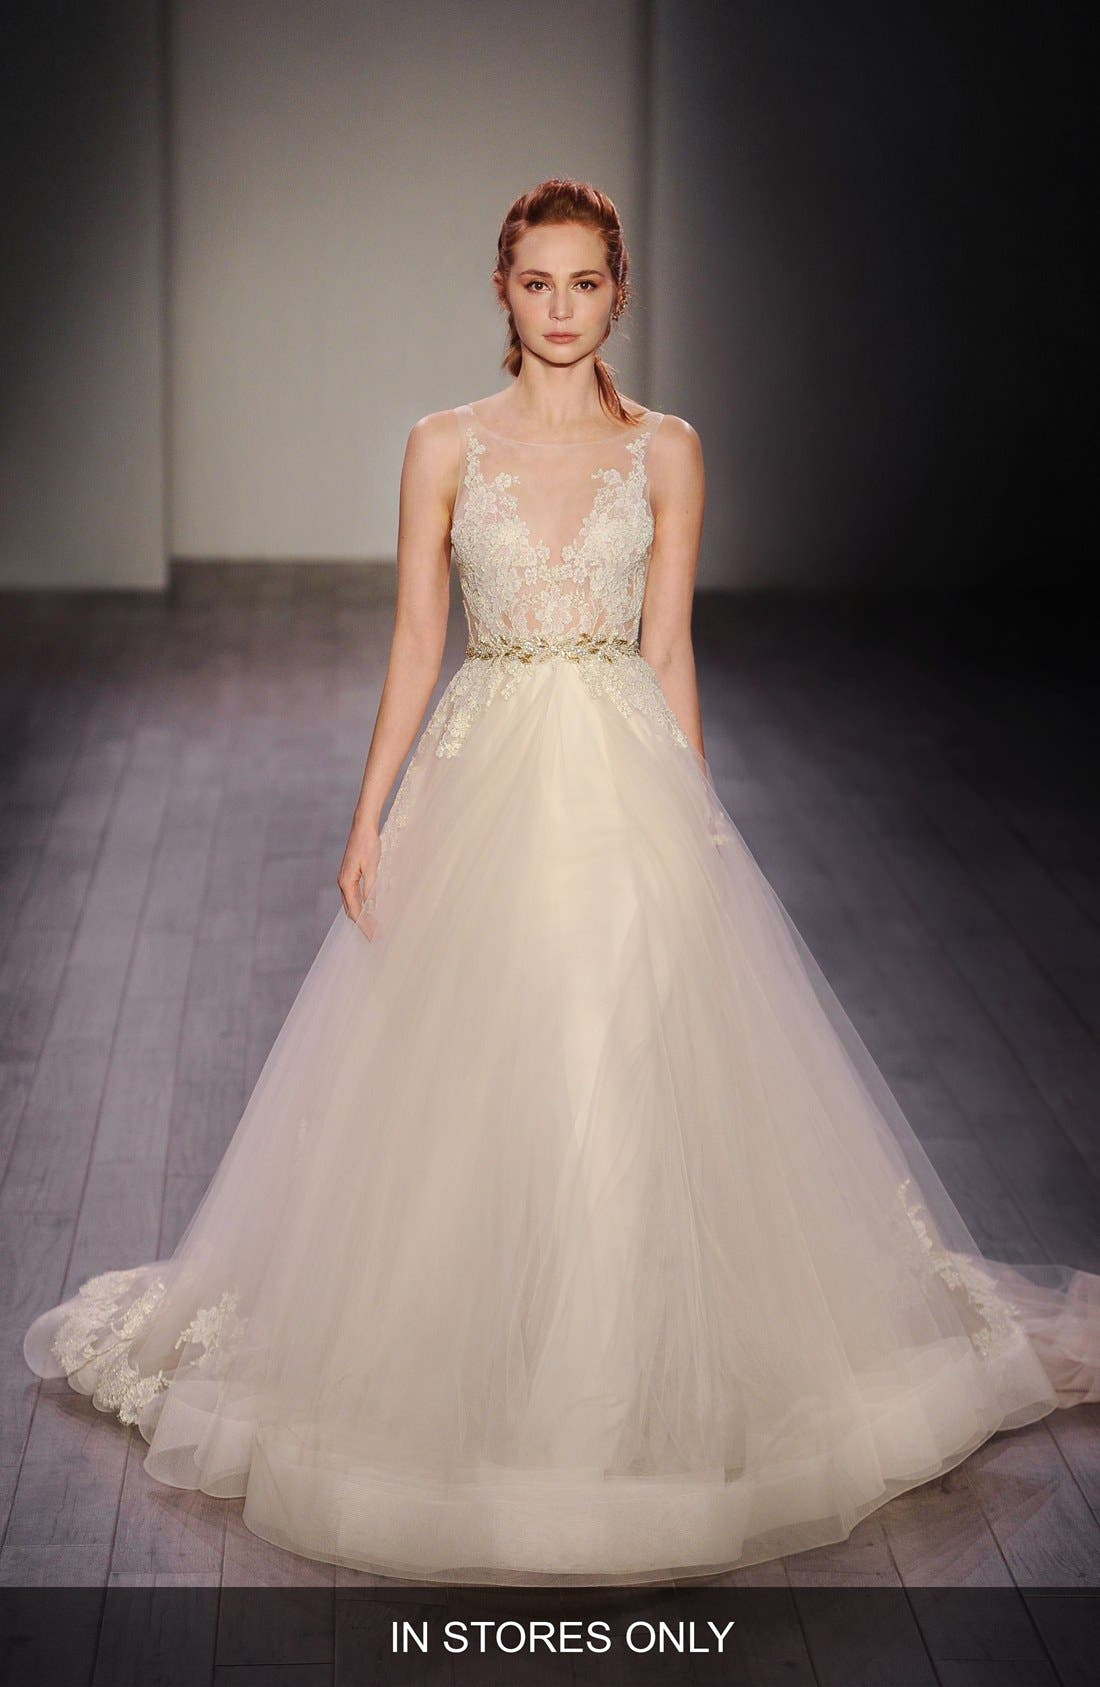 Lace Appliqué Tulle Ballgown Dress,                             Main thumbnail 1, color,                             IVORY/GOLD/CHAMPAGNE